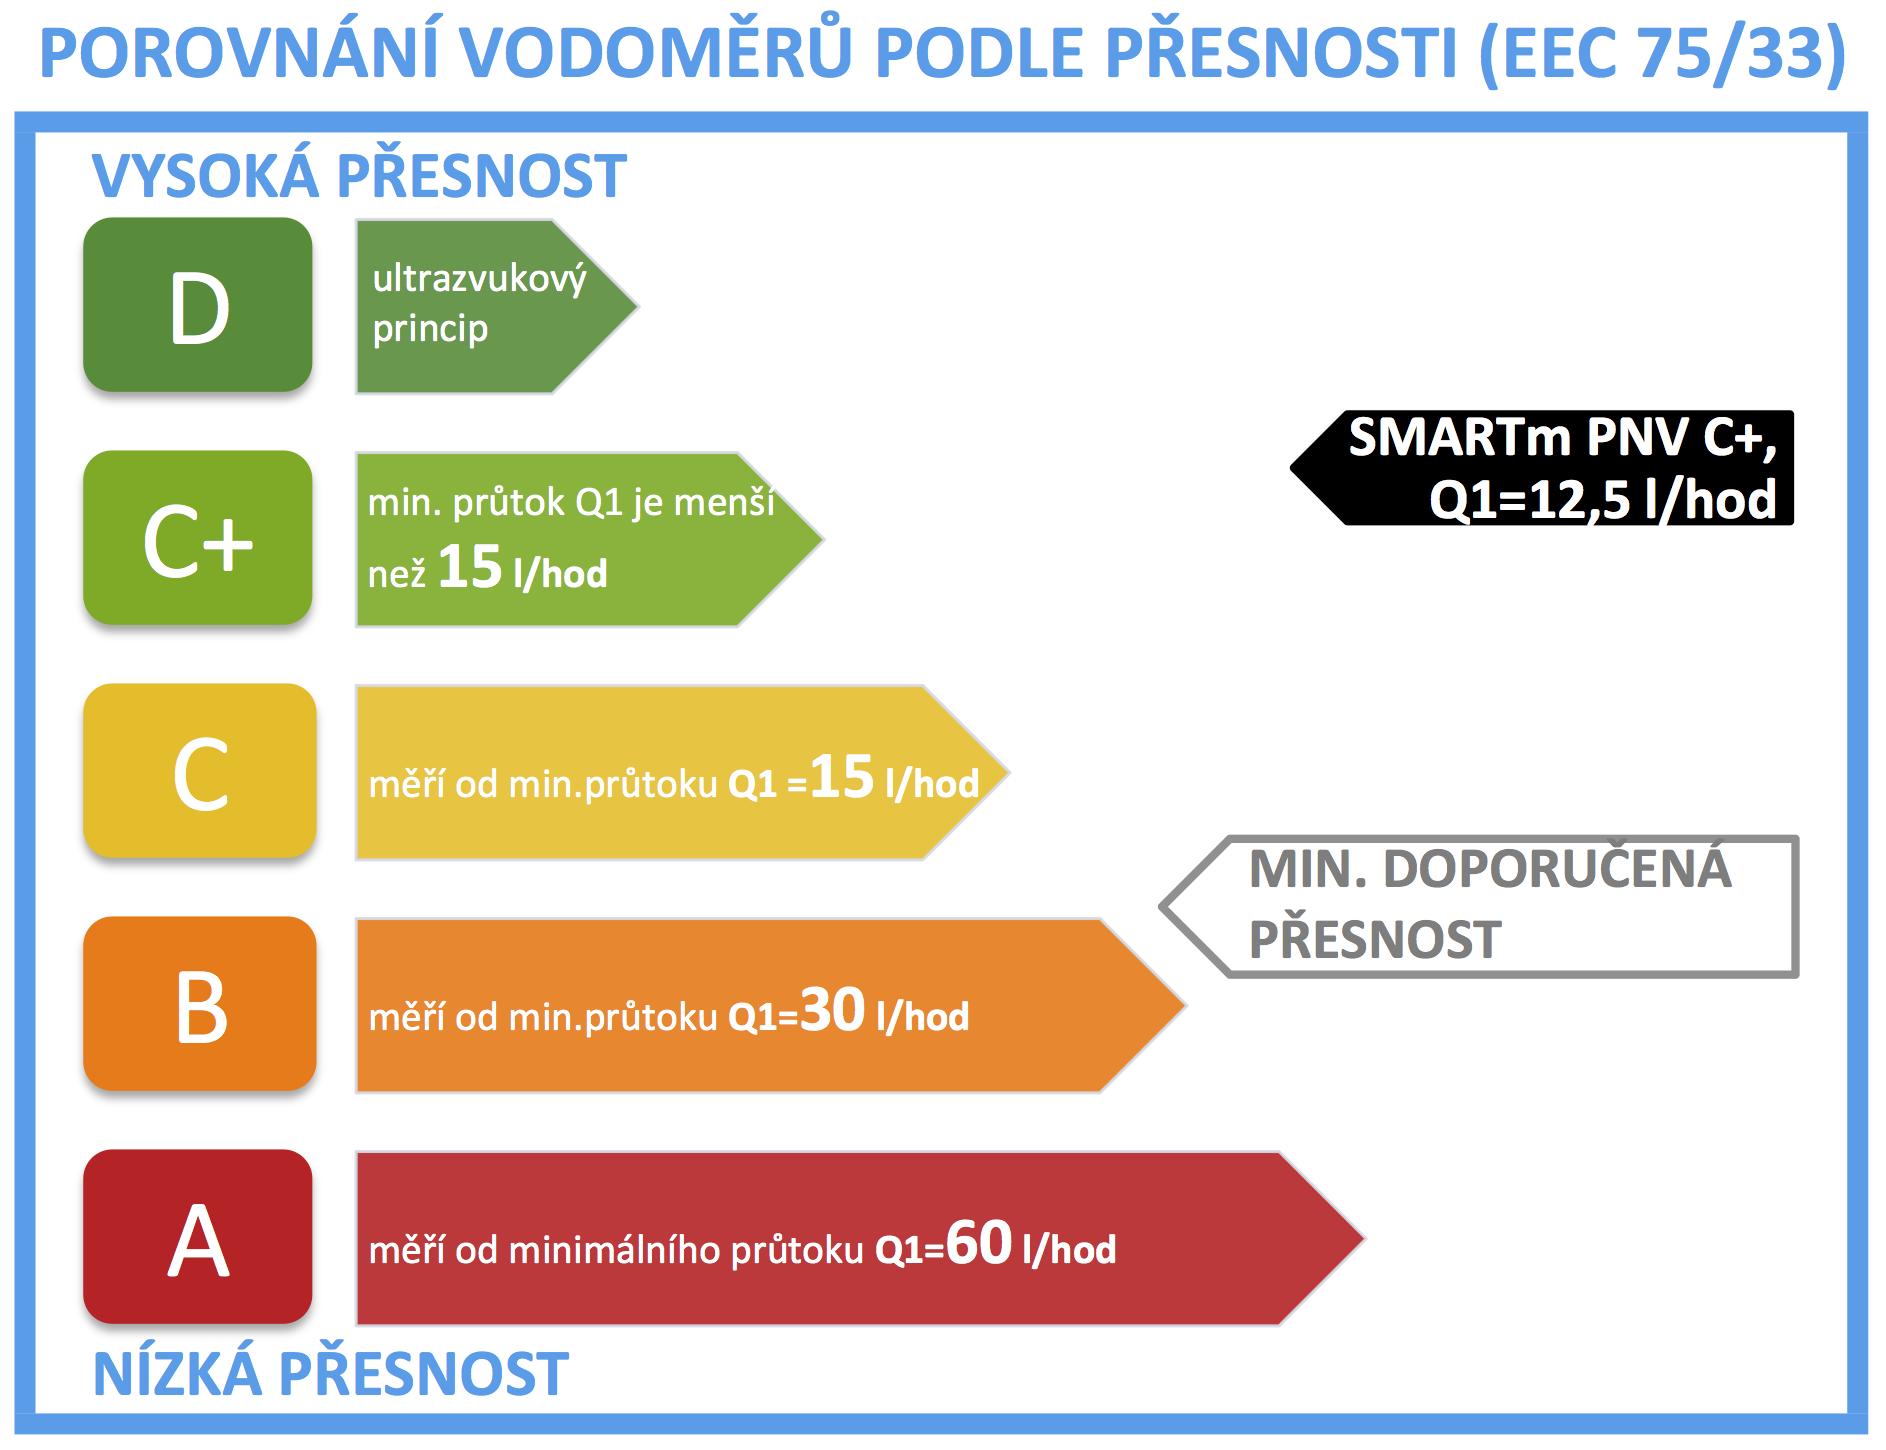 vodomer_SMARTm C+